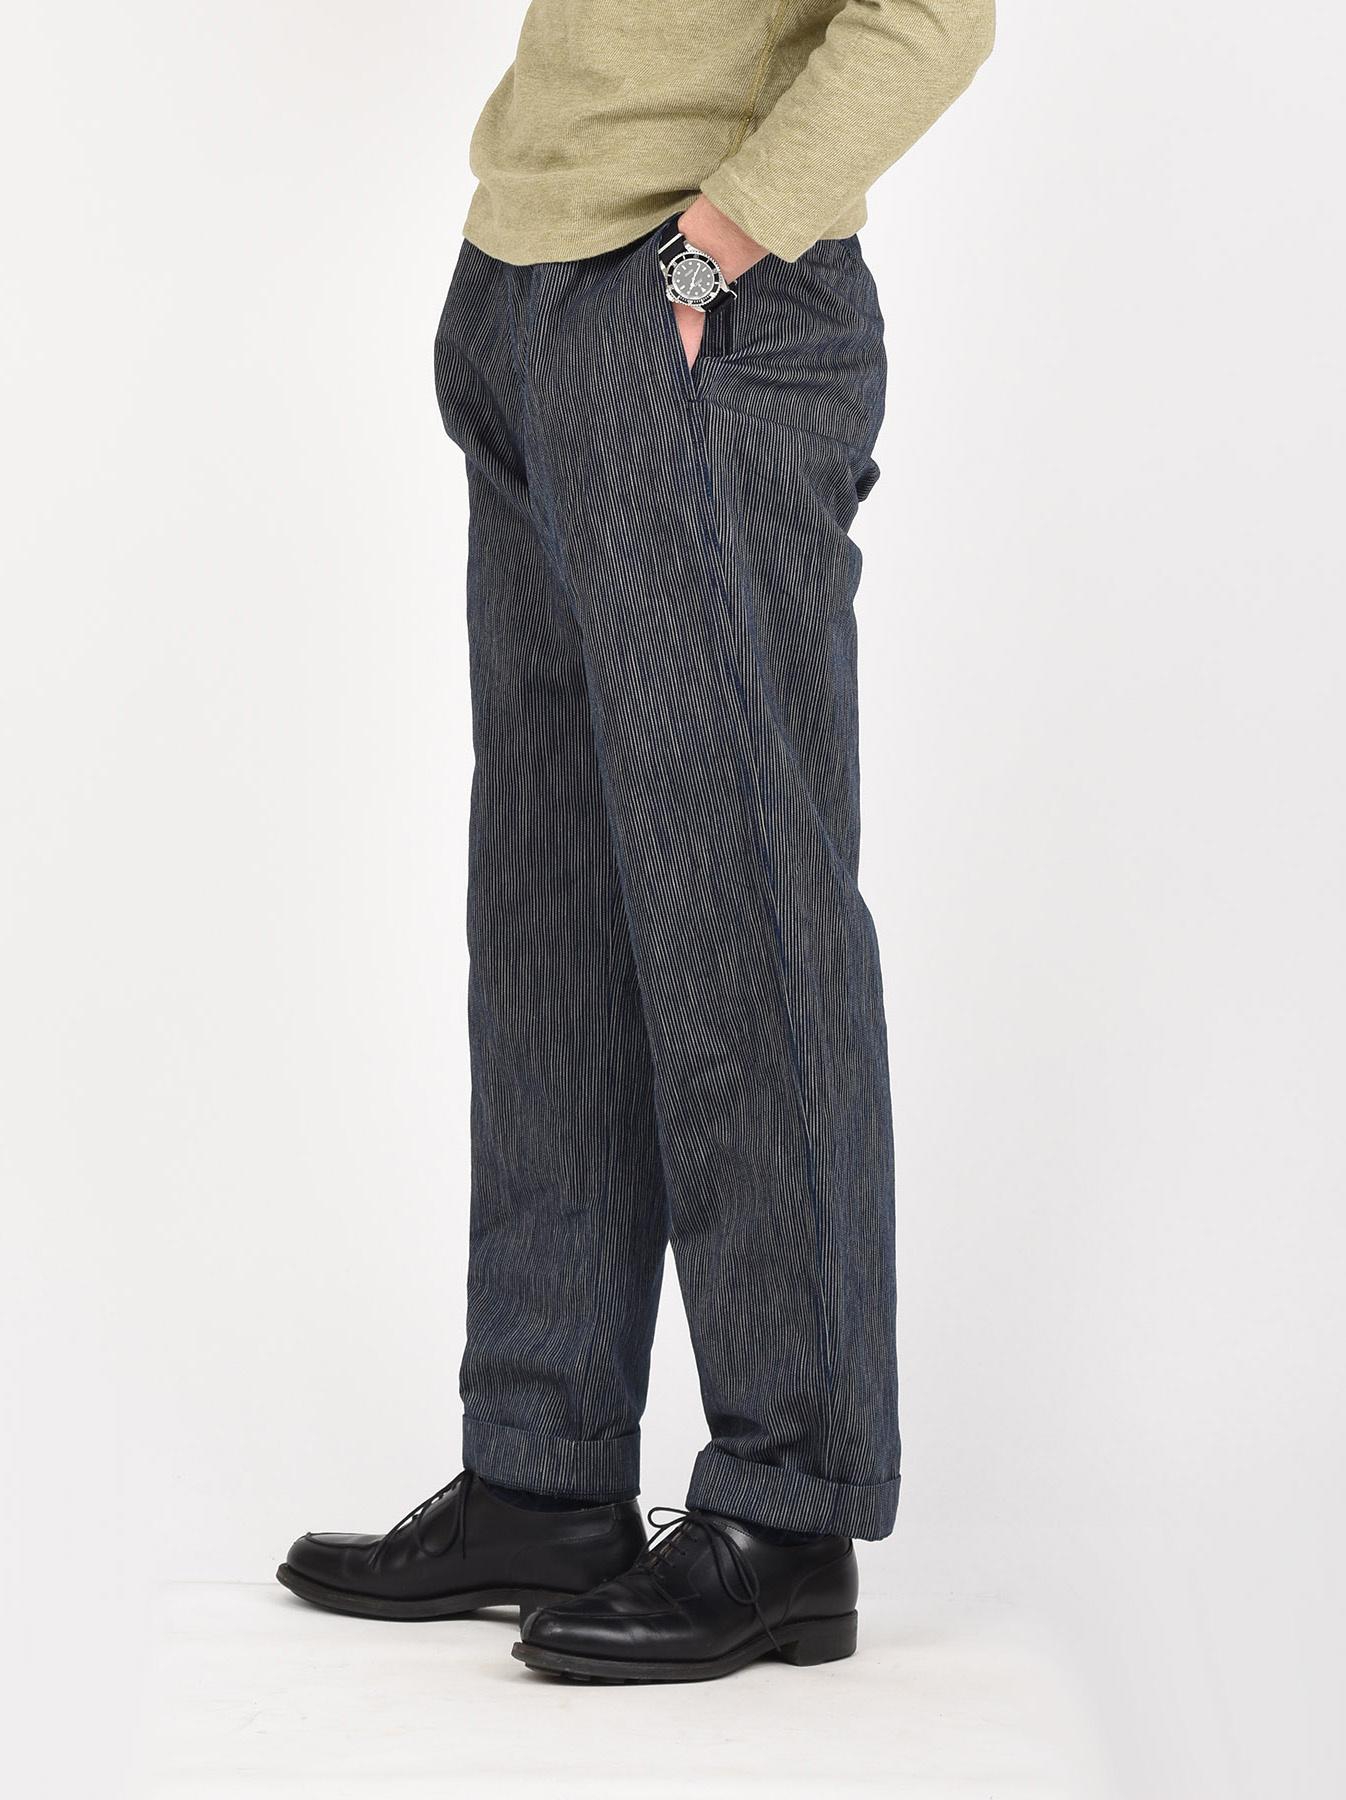 WH Indigo Mugi Yoko-shusi Work Pants-4